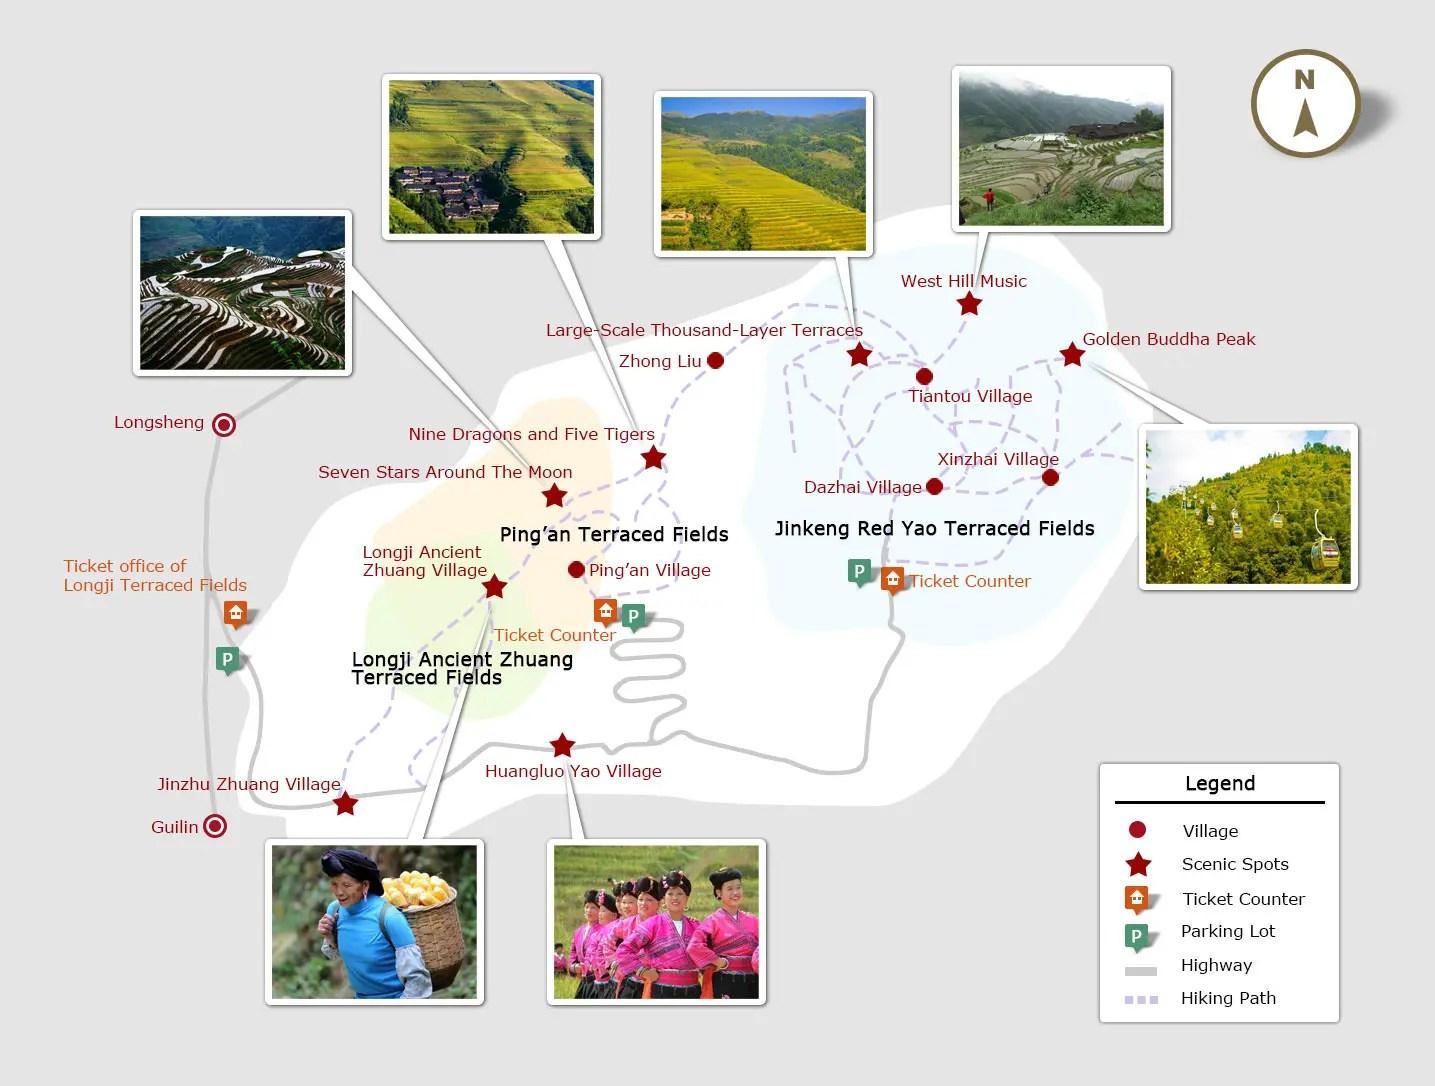 Resultado de imagen de map of rice terraces longji